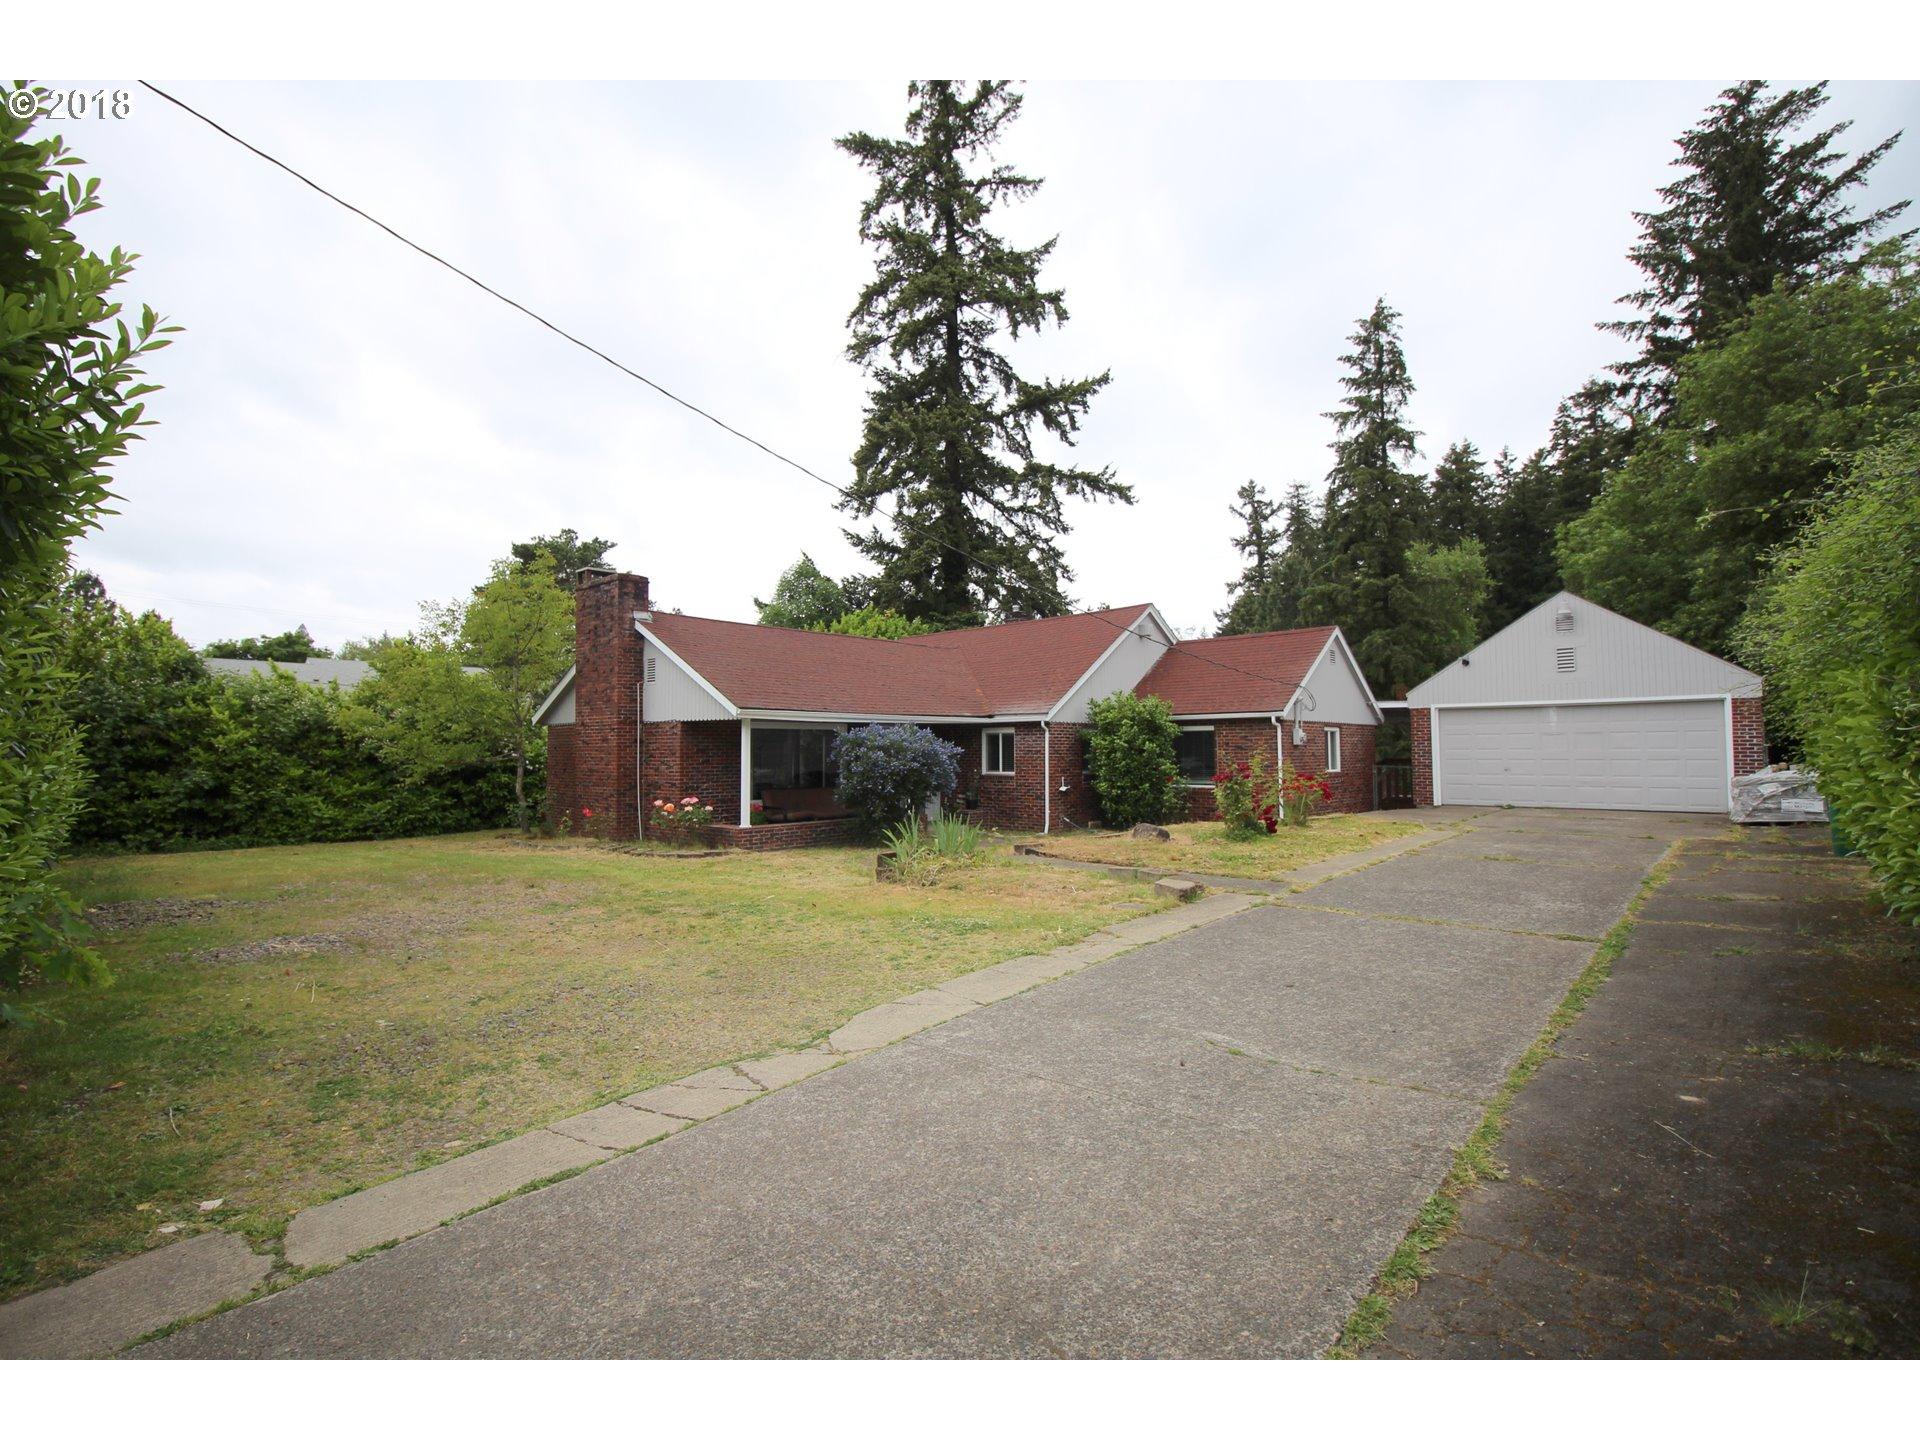 8415 SW LOCUST ST Portland, OR 97223 - MLS #: 18074502